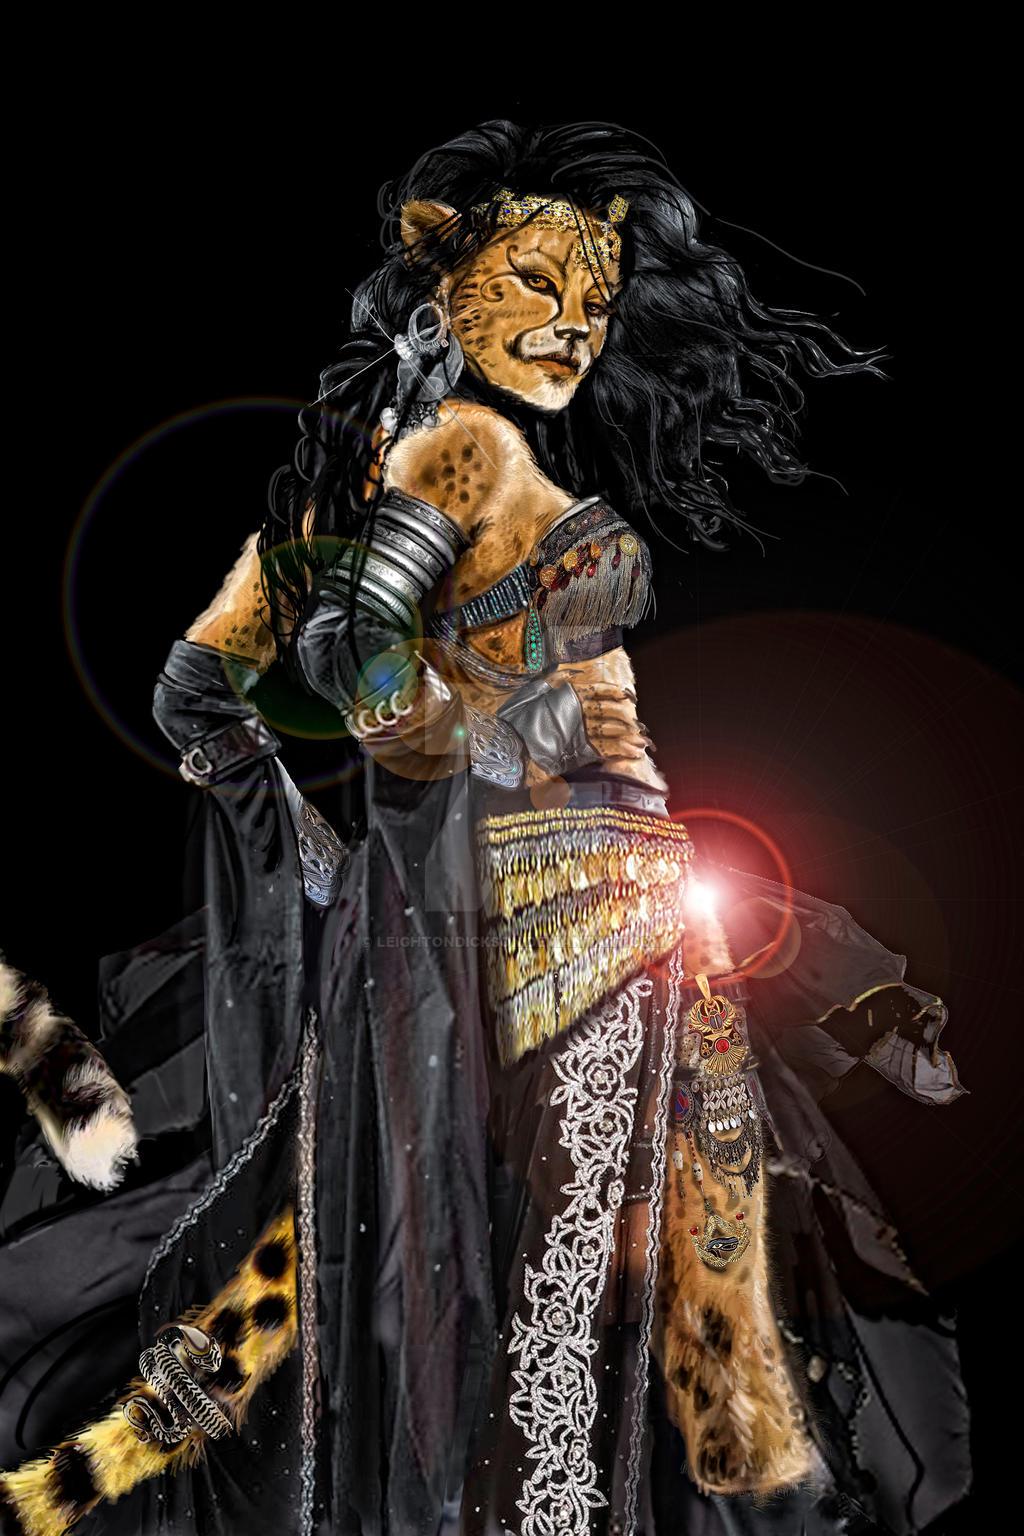 Cheetah Gypsy Woman - Sherah by leightondickson on DeviantArt